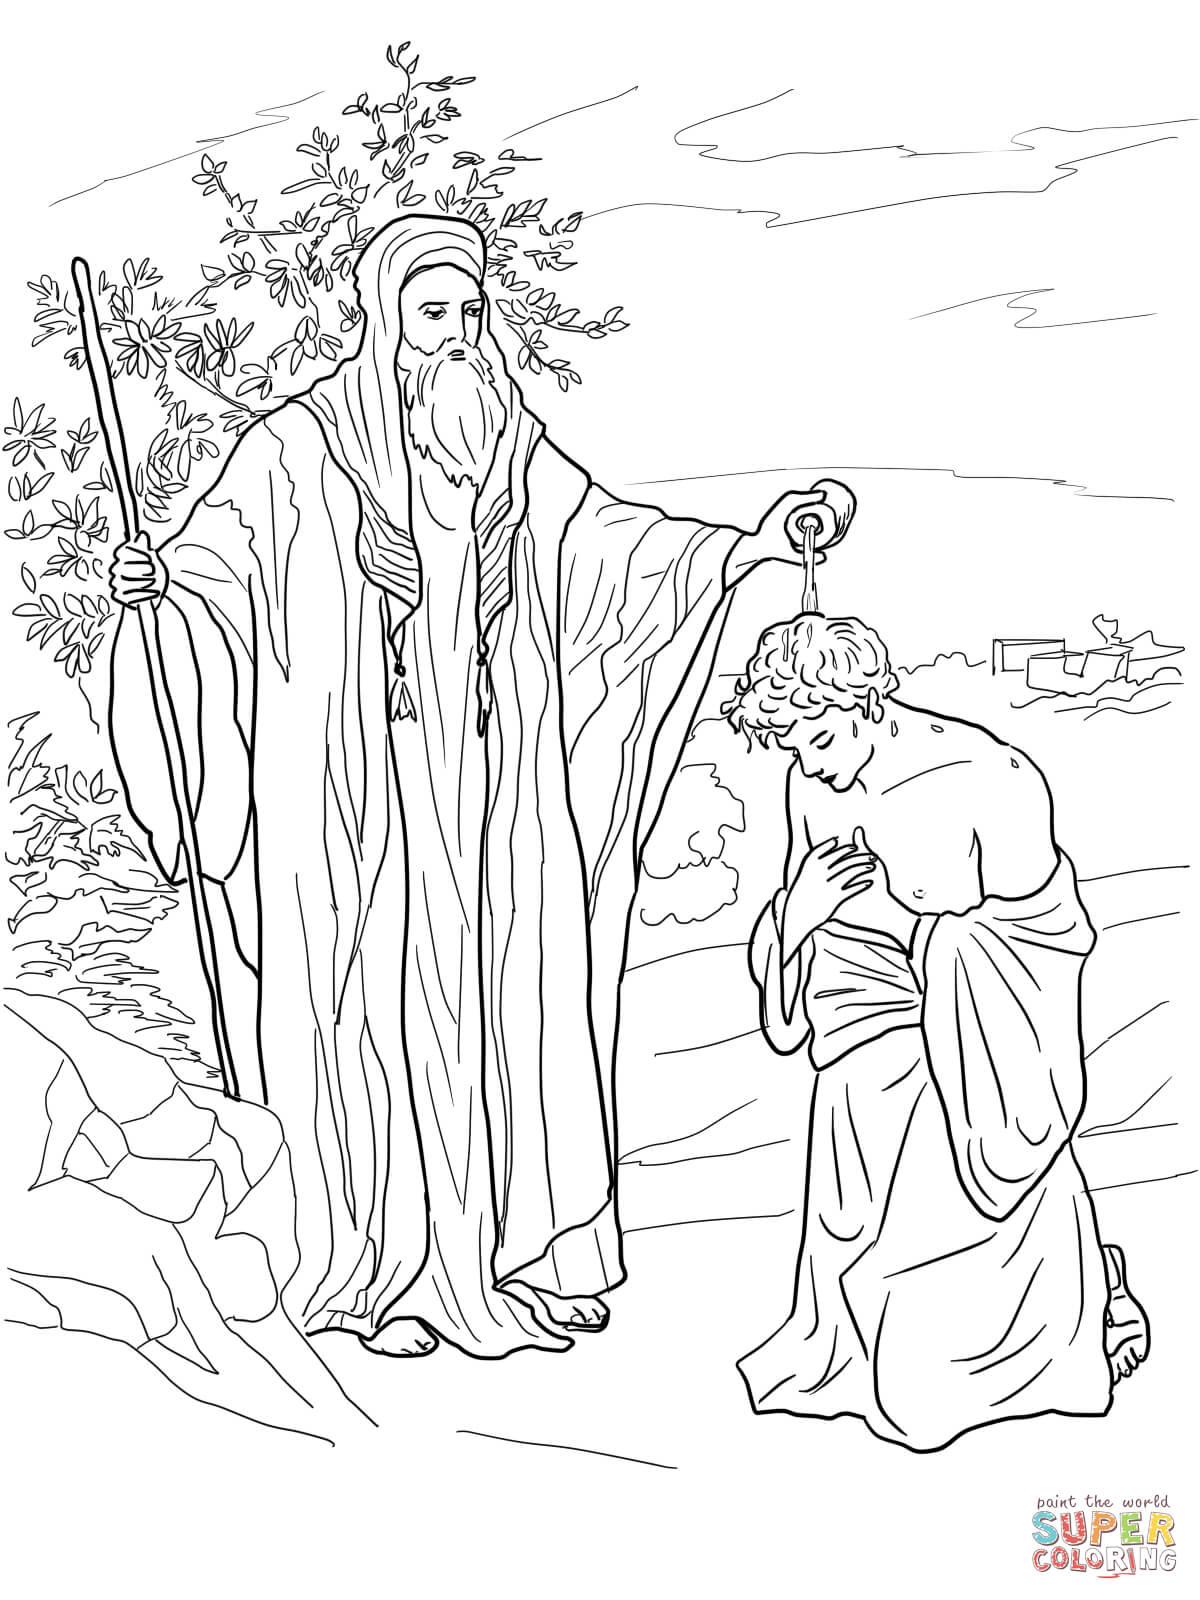 King Saul Disobeyed God